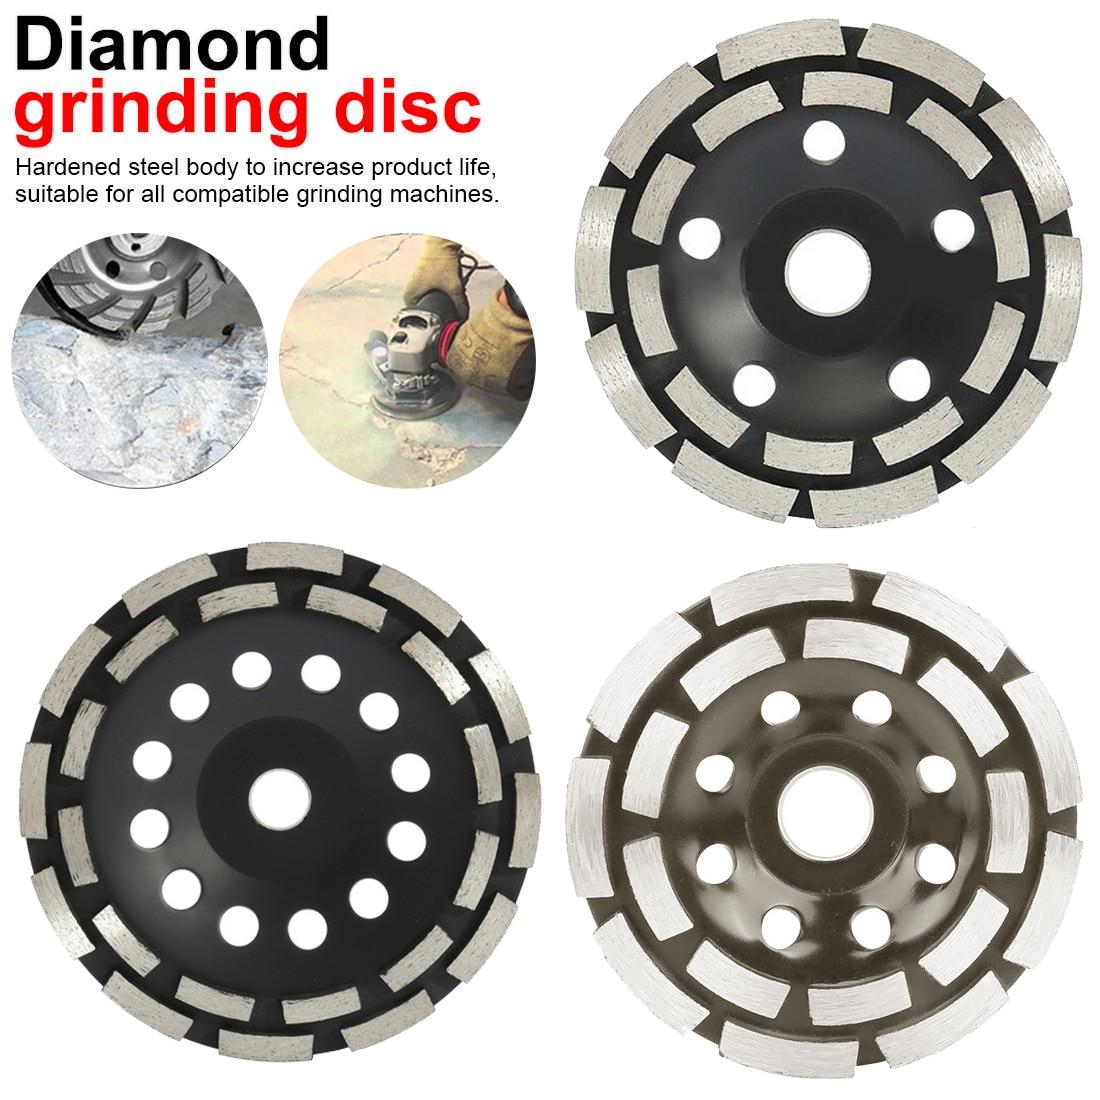 Saw Blade 115/125/180mm Diamond Grinding Disc Abrasives Concrete Tools Grinder Wheel Metalworking Cutting Grinding Wheels Cup|Grinding Wheels| |  - title=